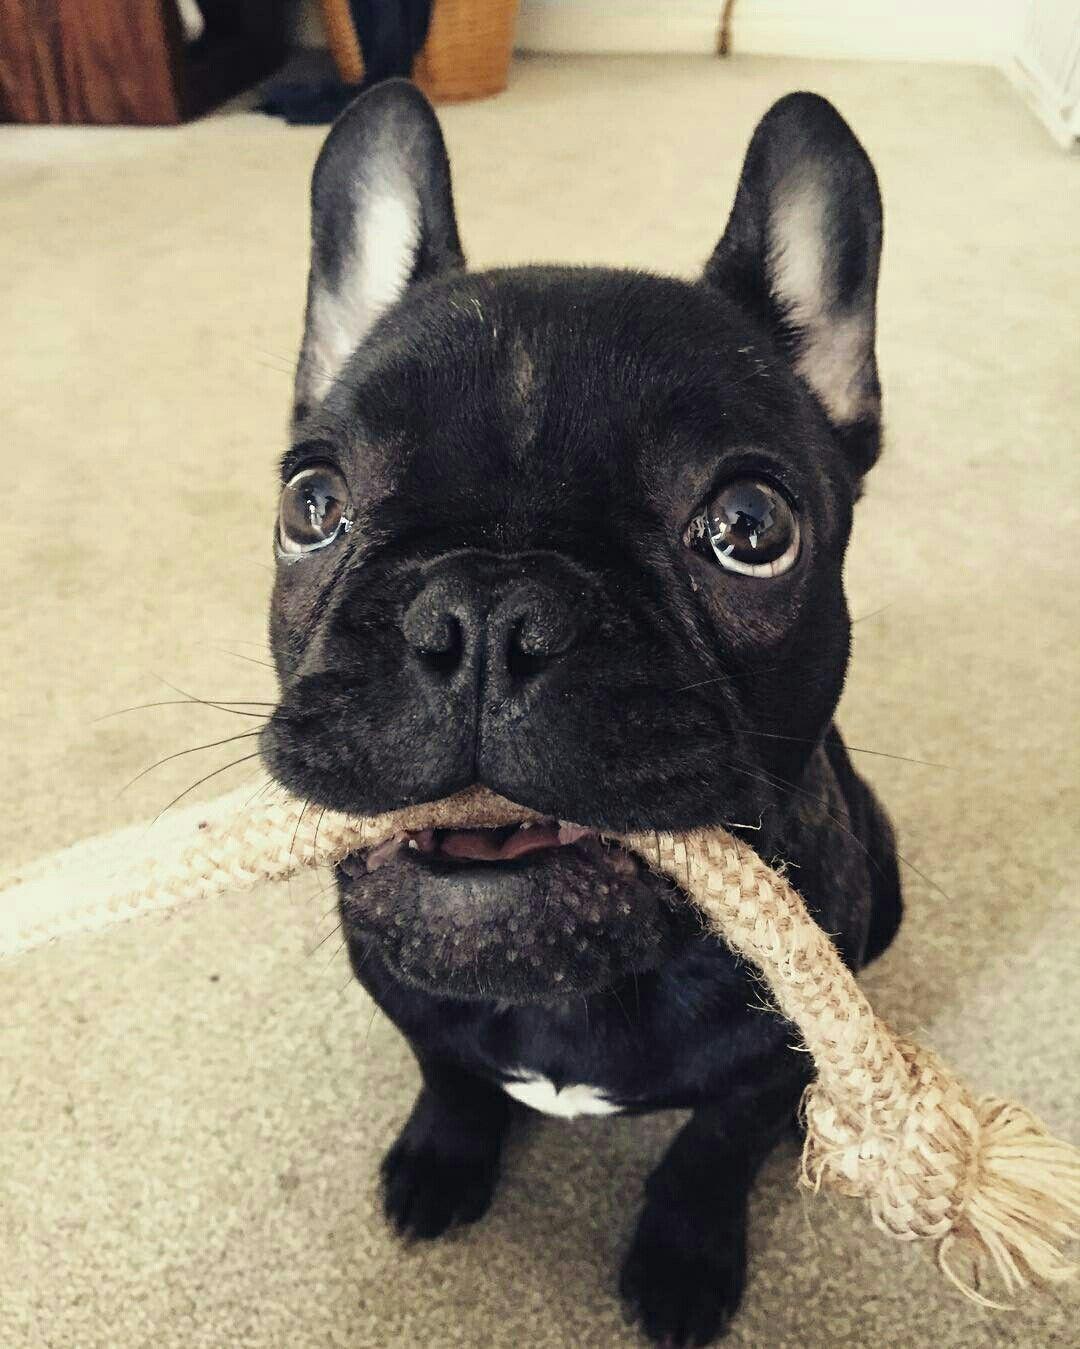 French Bulldog Playful and Smart French bulldog